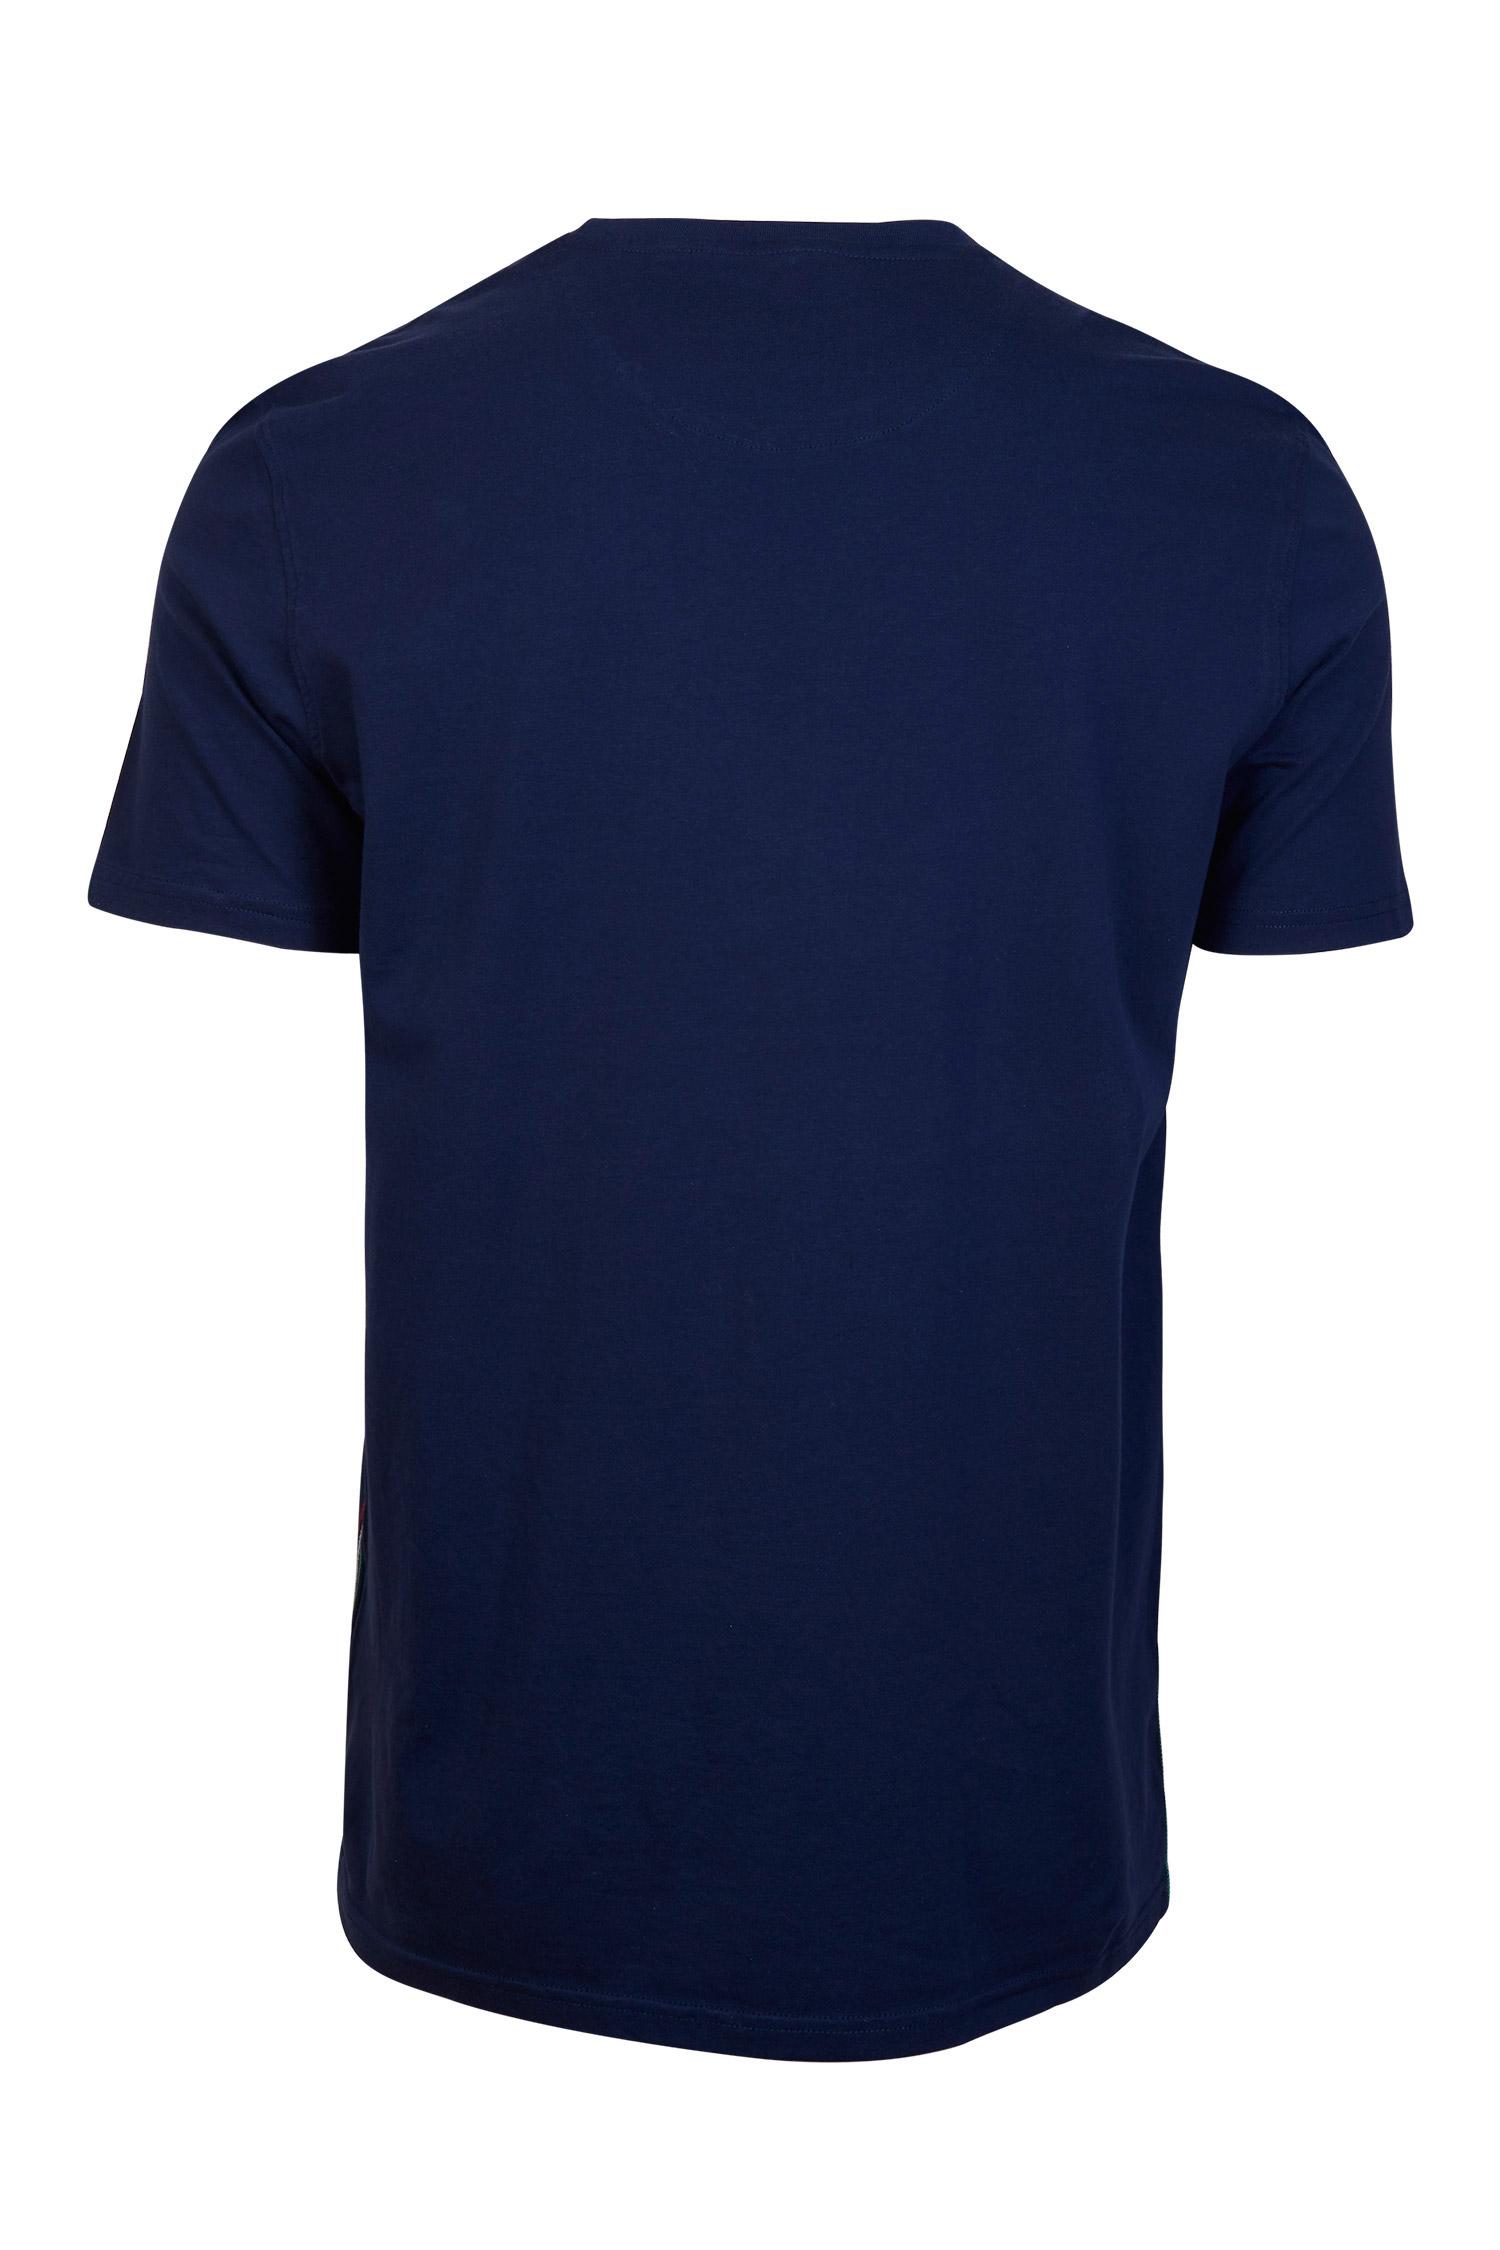 Sport, Camisetas M. Corta, 107931, MARINO | Zoom